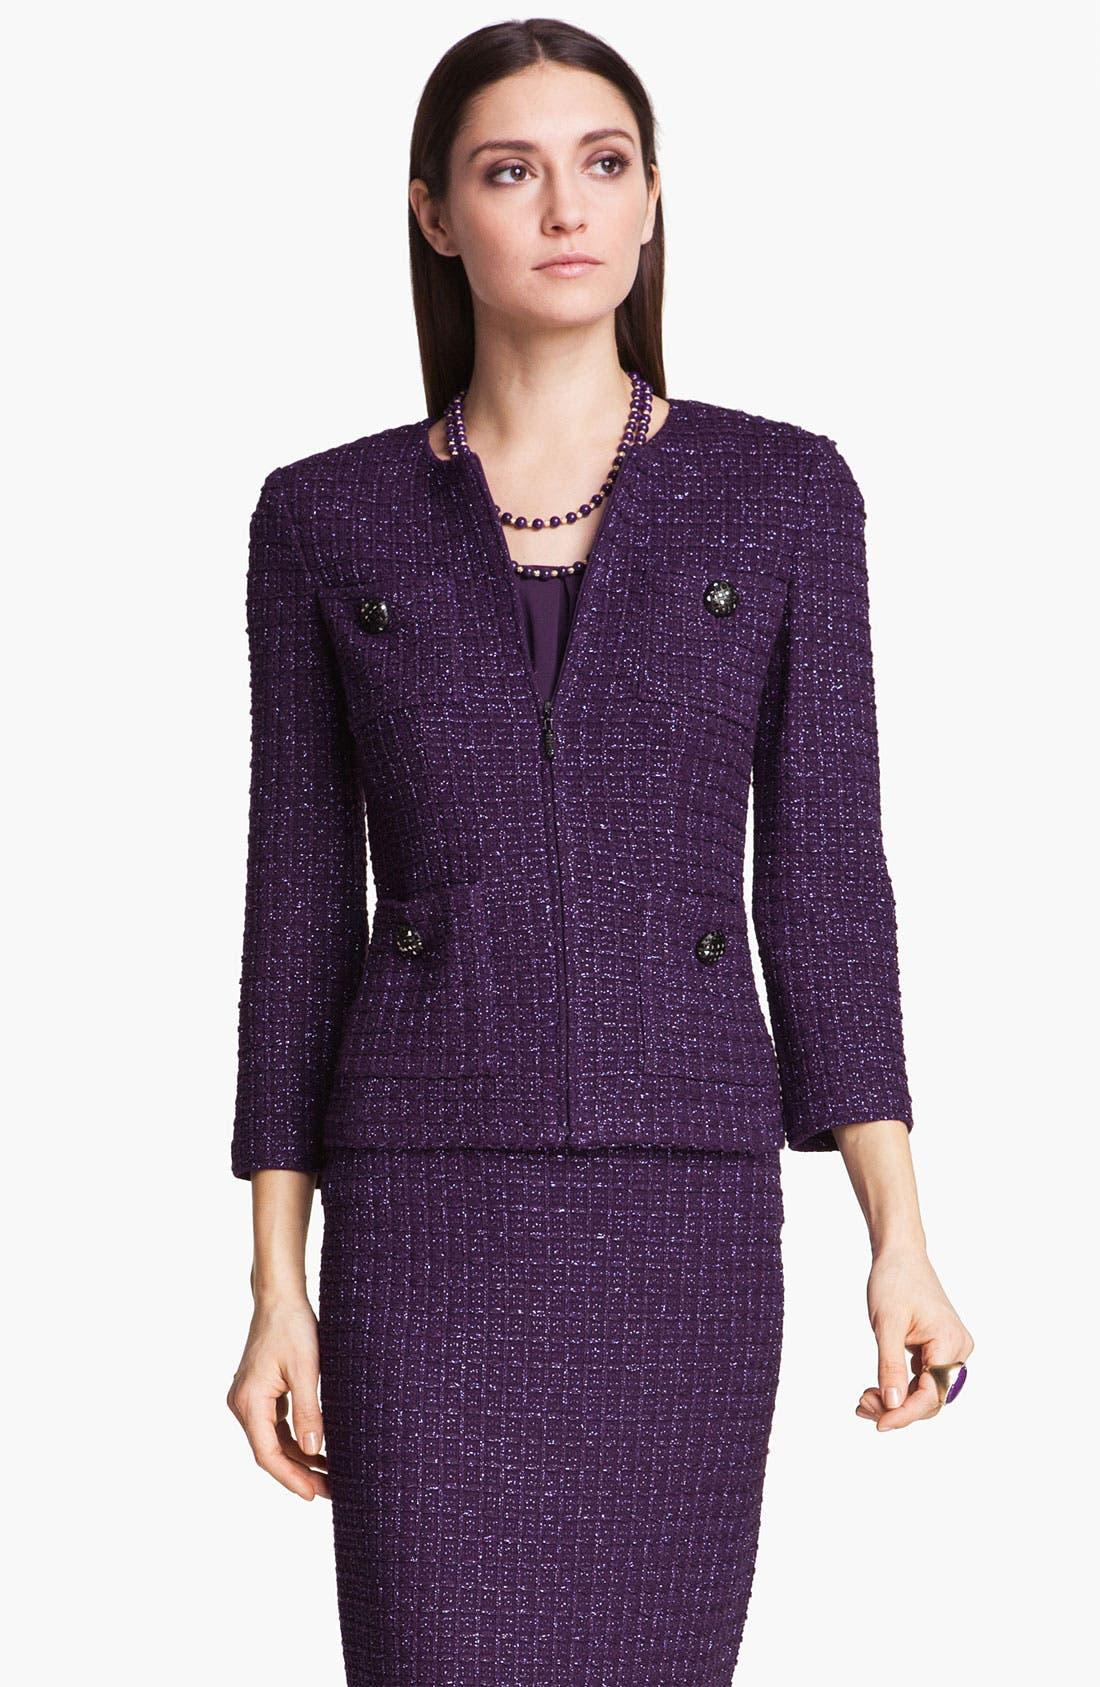 Alternate Image 1 Selected - St. John Collection Shimmer Tweed Jacket